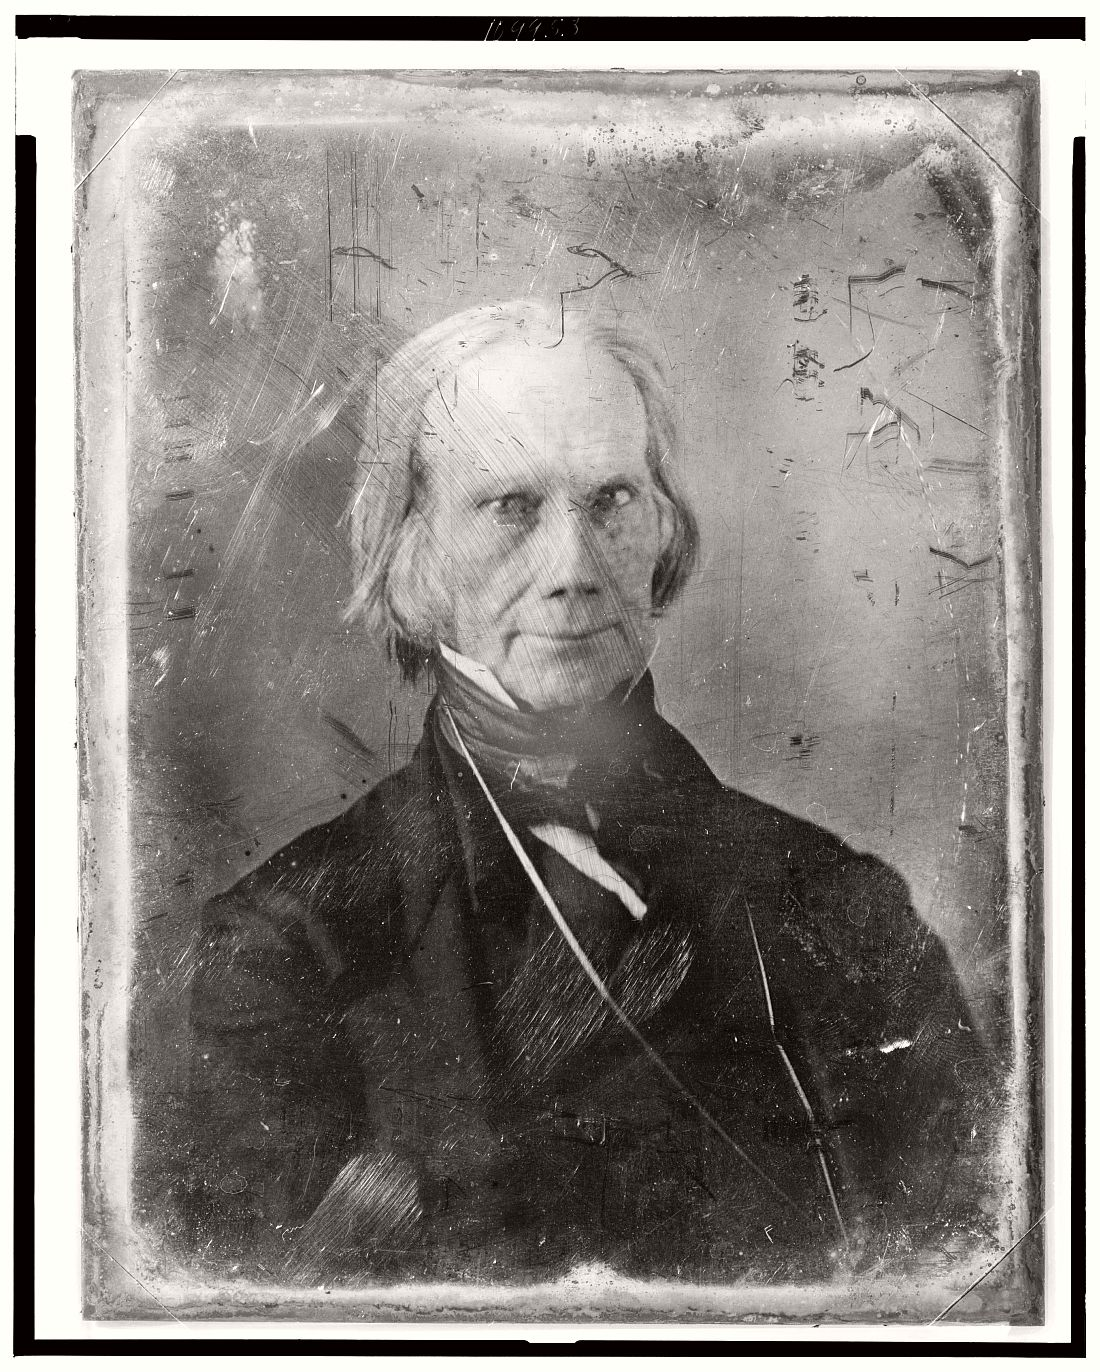 vintage-daguerreotype-portraits-from-xix-century-1844-1860-33